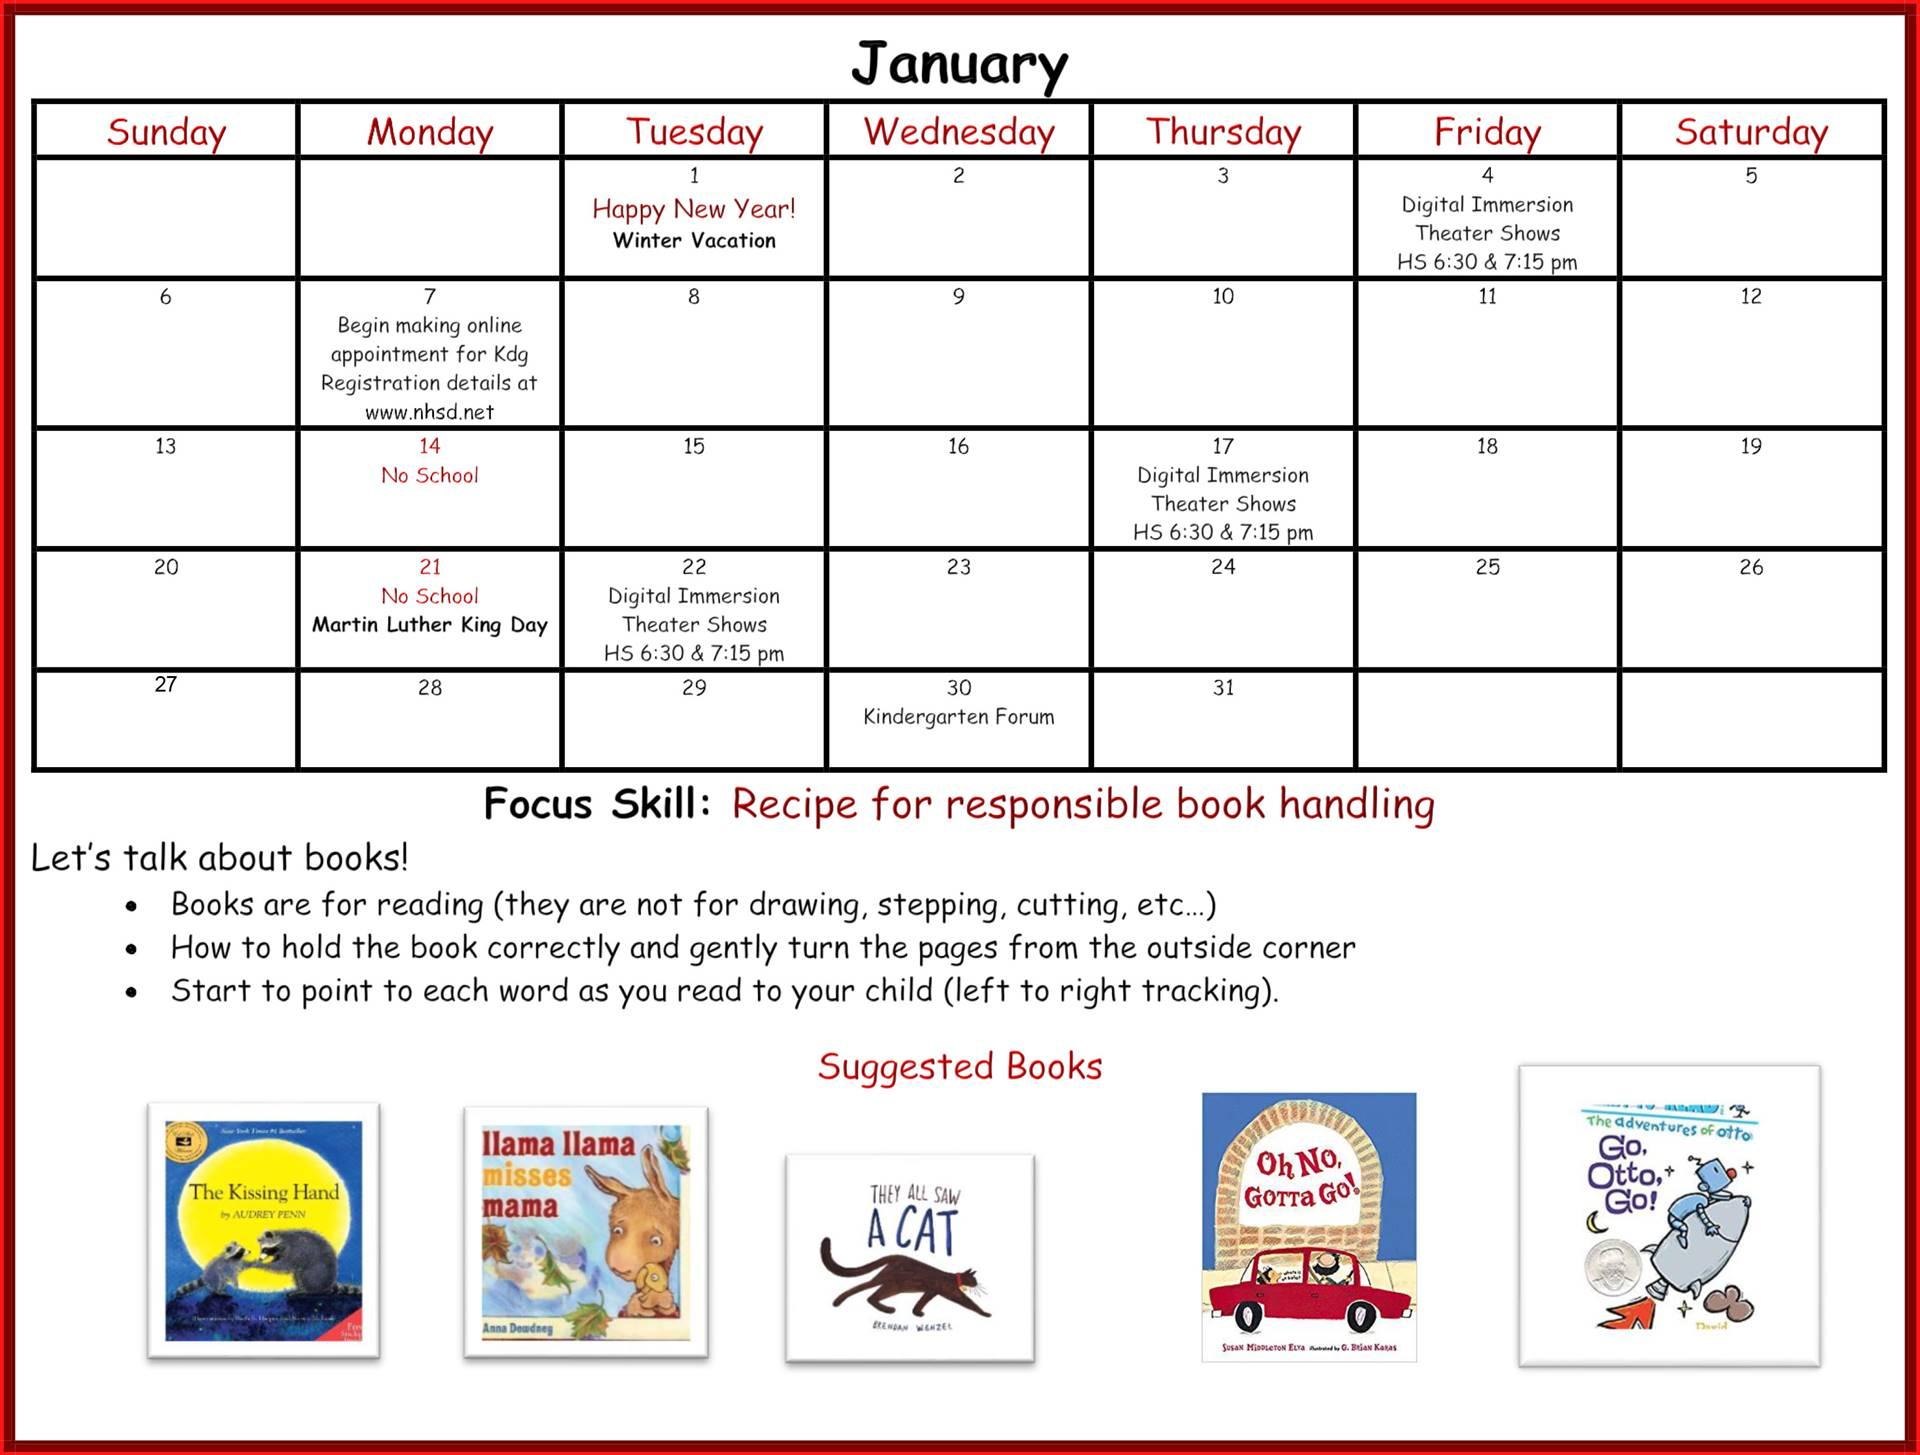 Kindergarten Readiness Calendar - January page 1